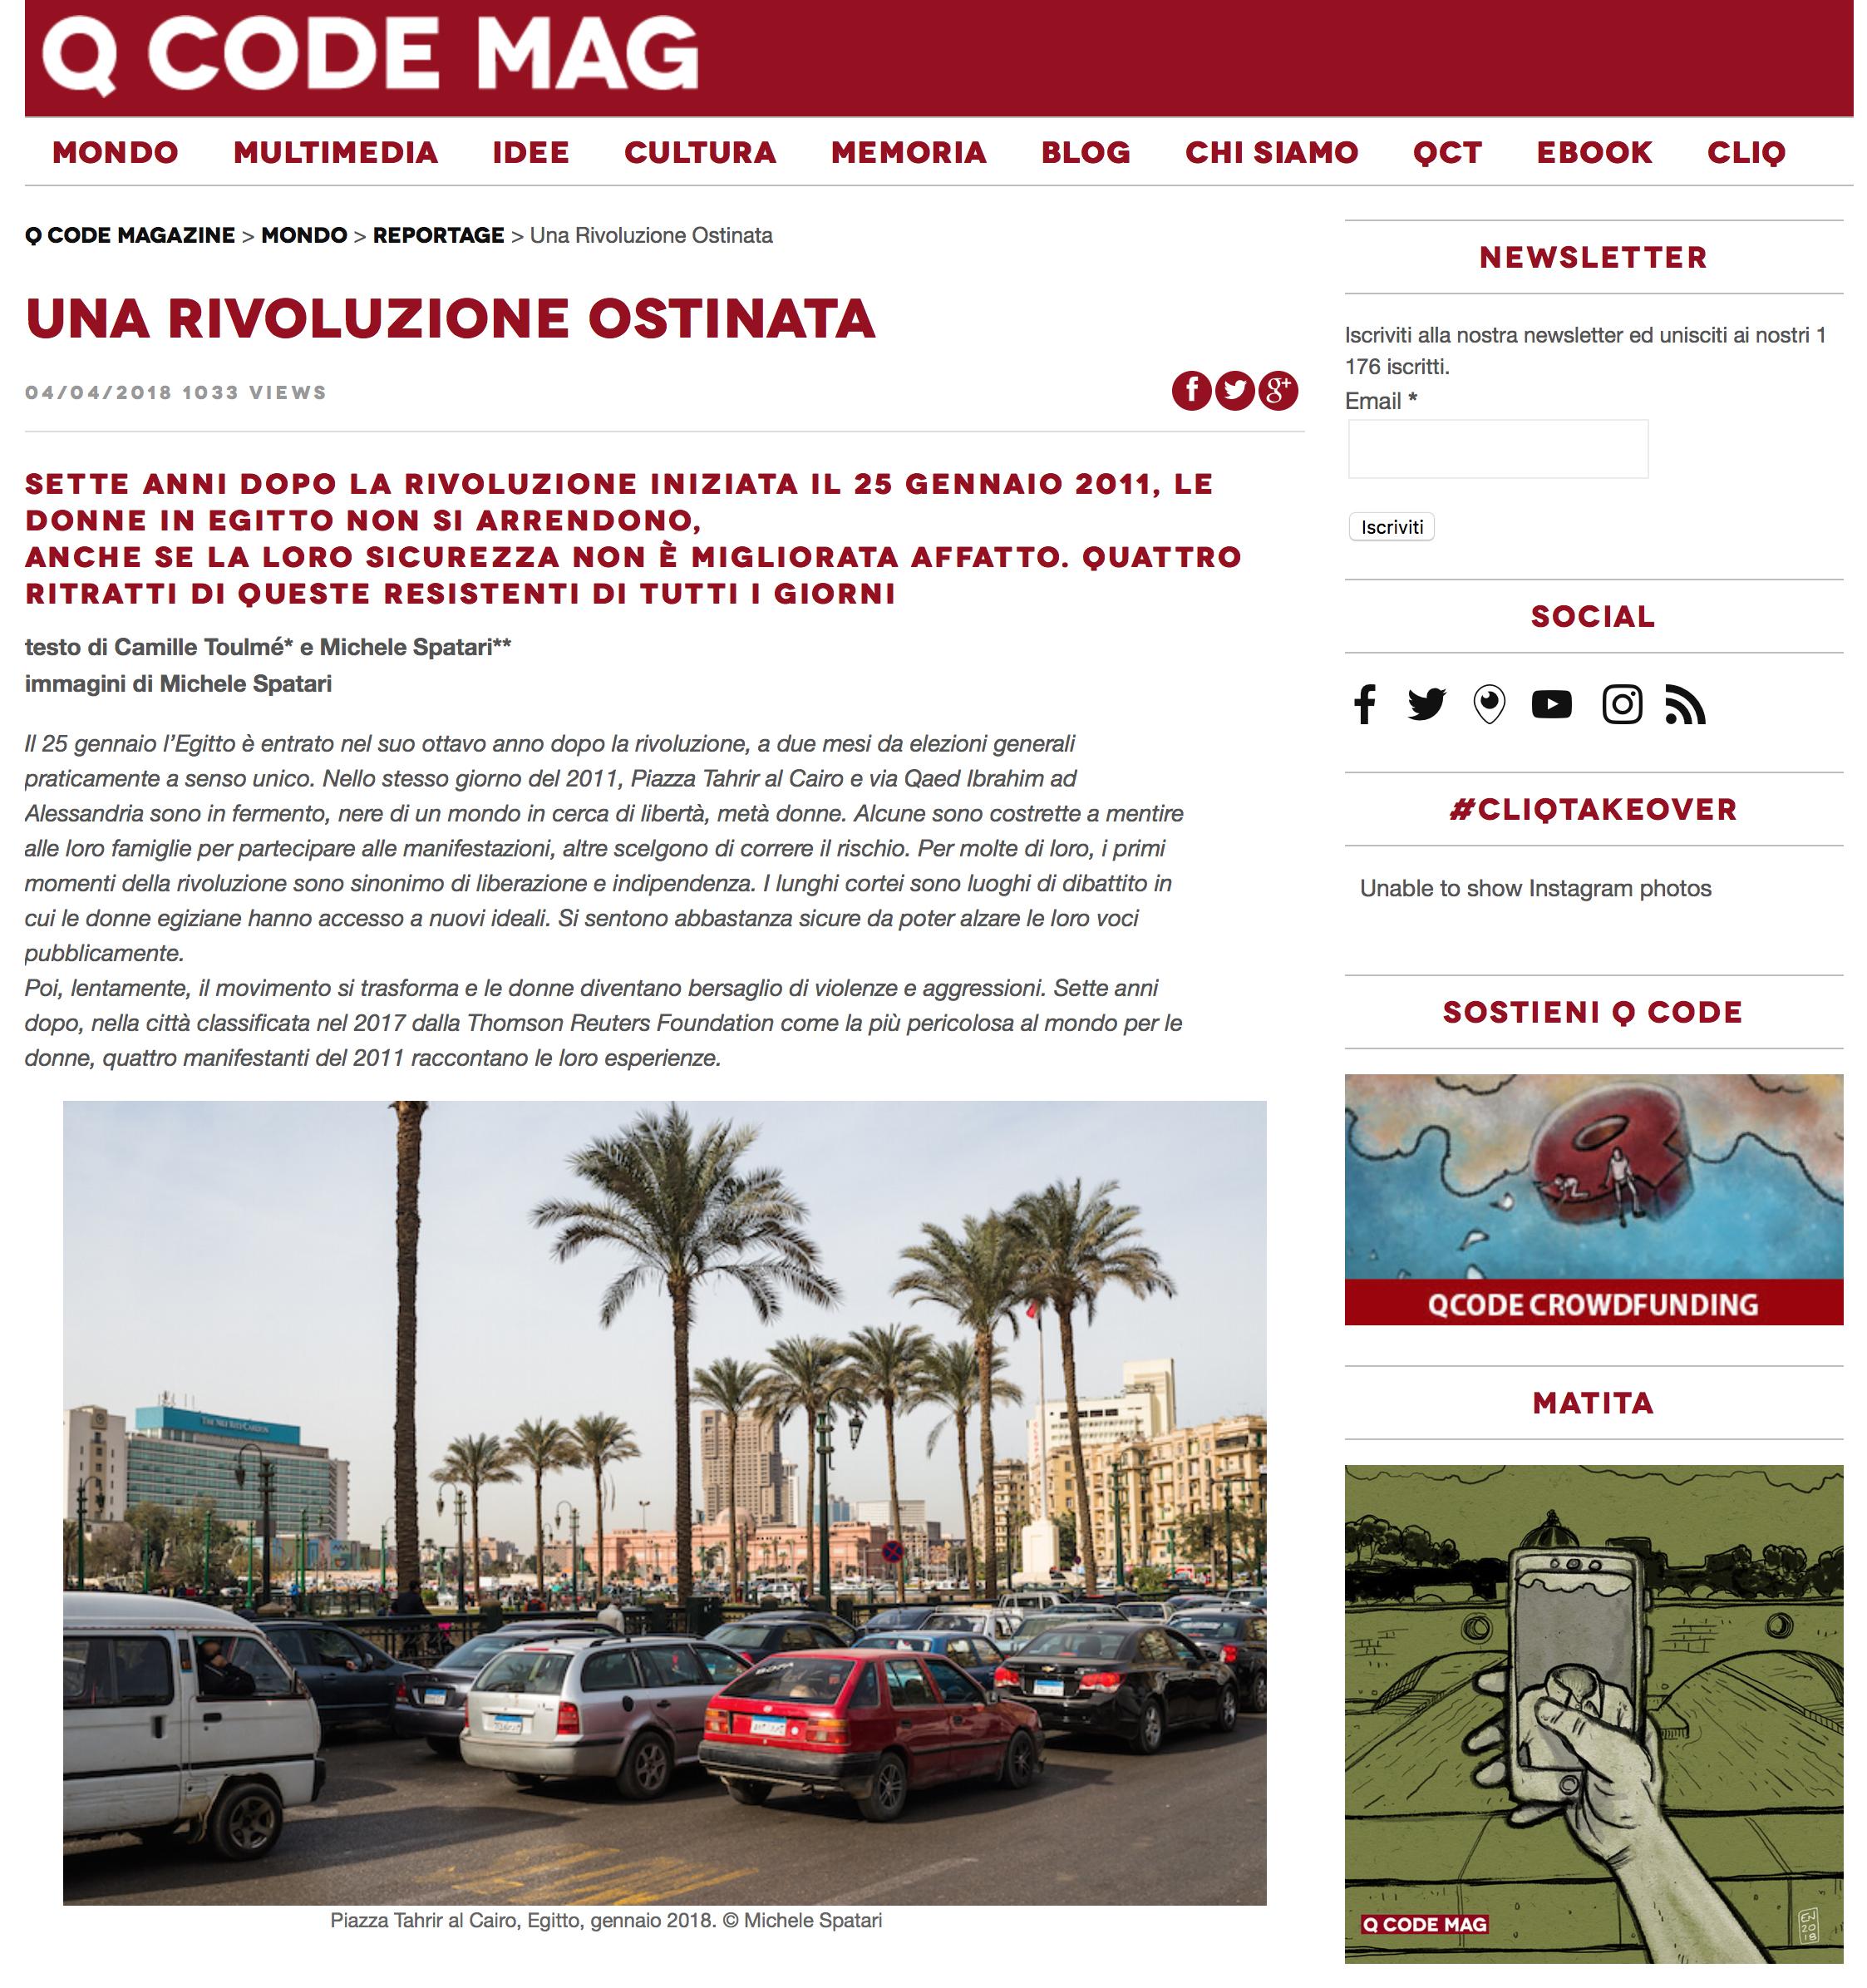 Q Code Magazine - 04/04/2018